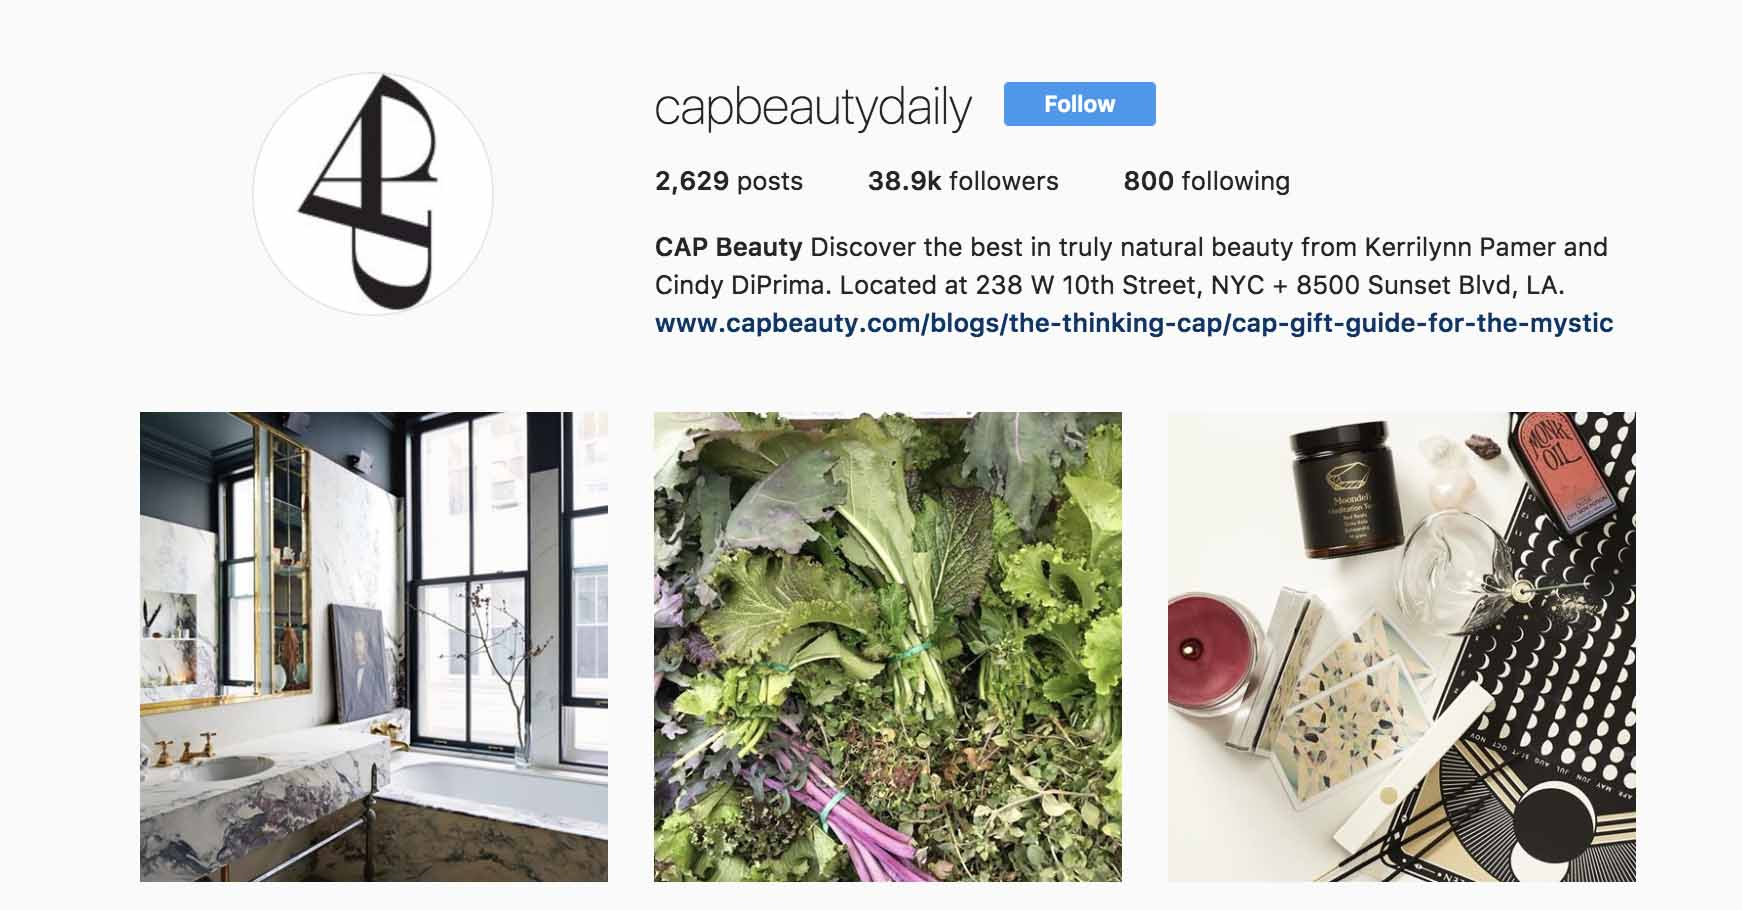 instagram-bio-ideas-capbeautydaily